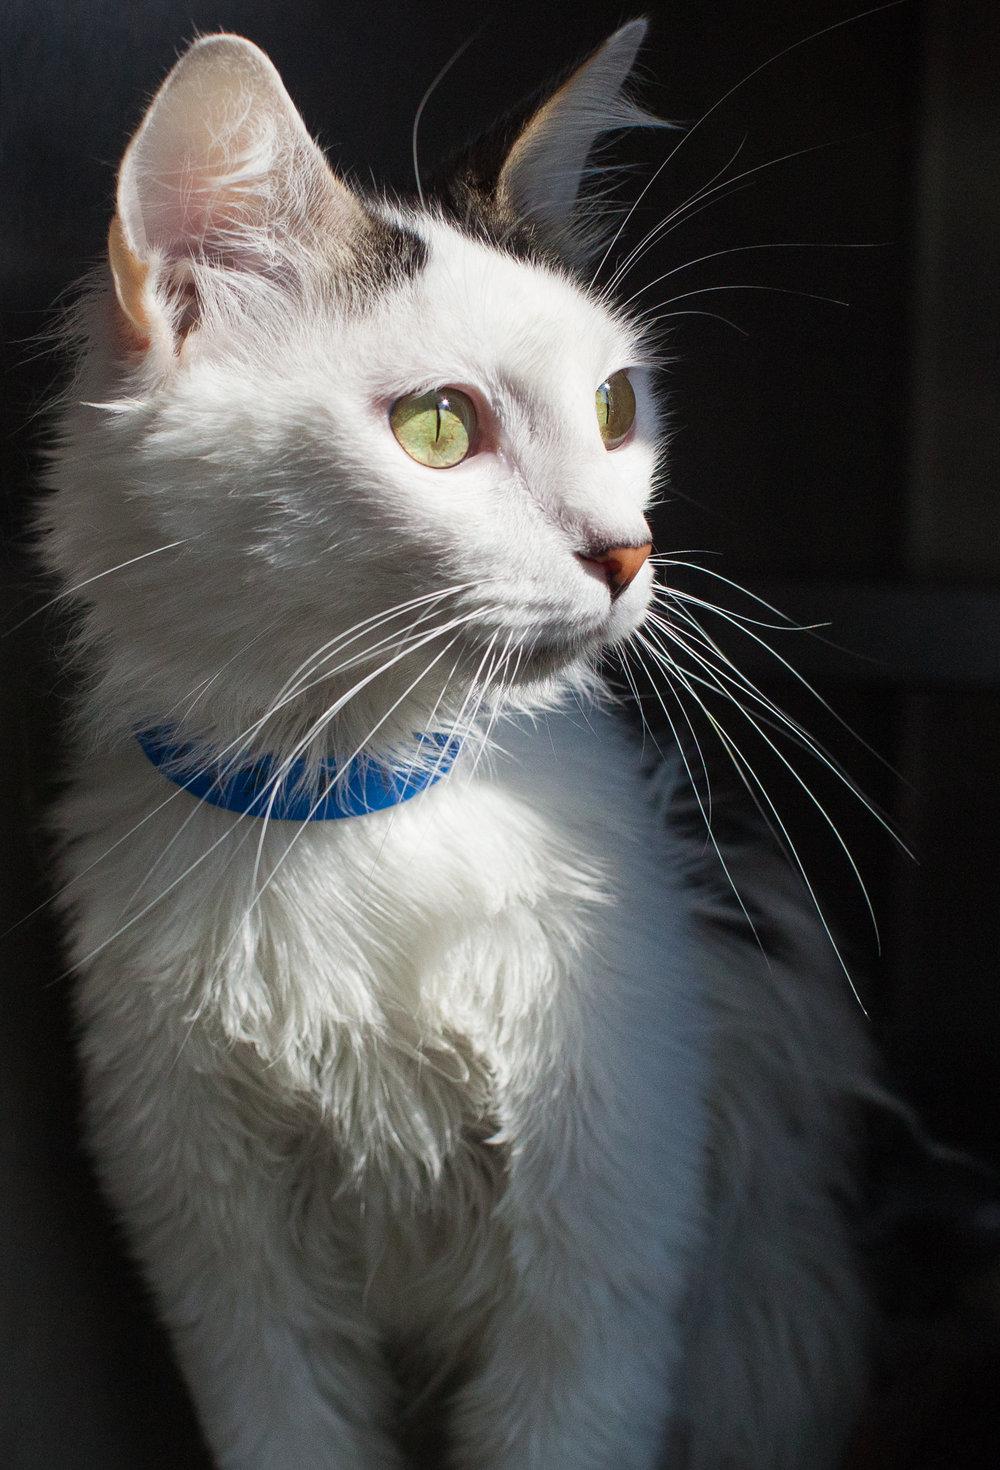 055_animal-photography-cats-dogs-volunteer_MG_8974.jpg